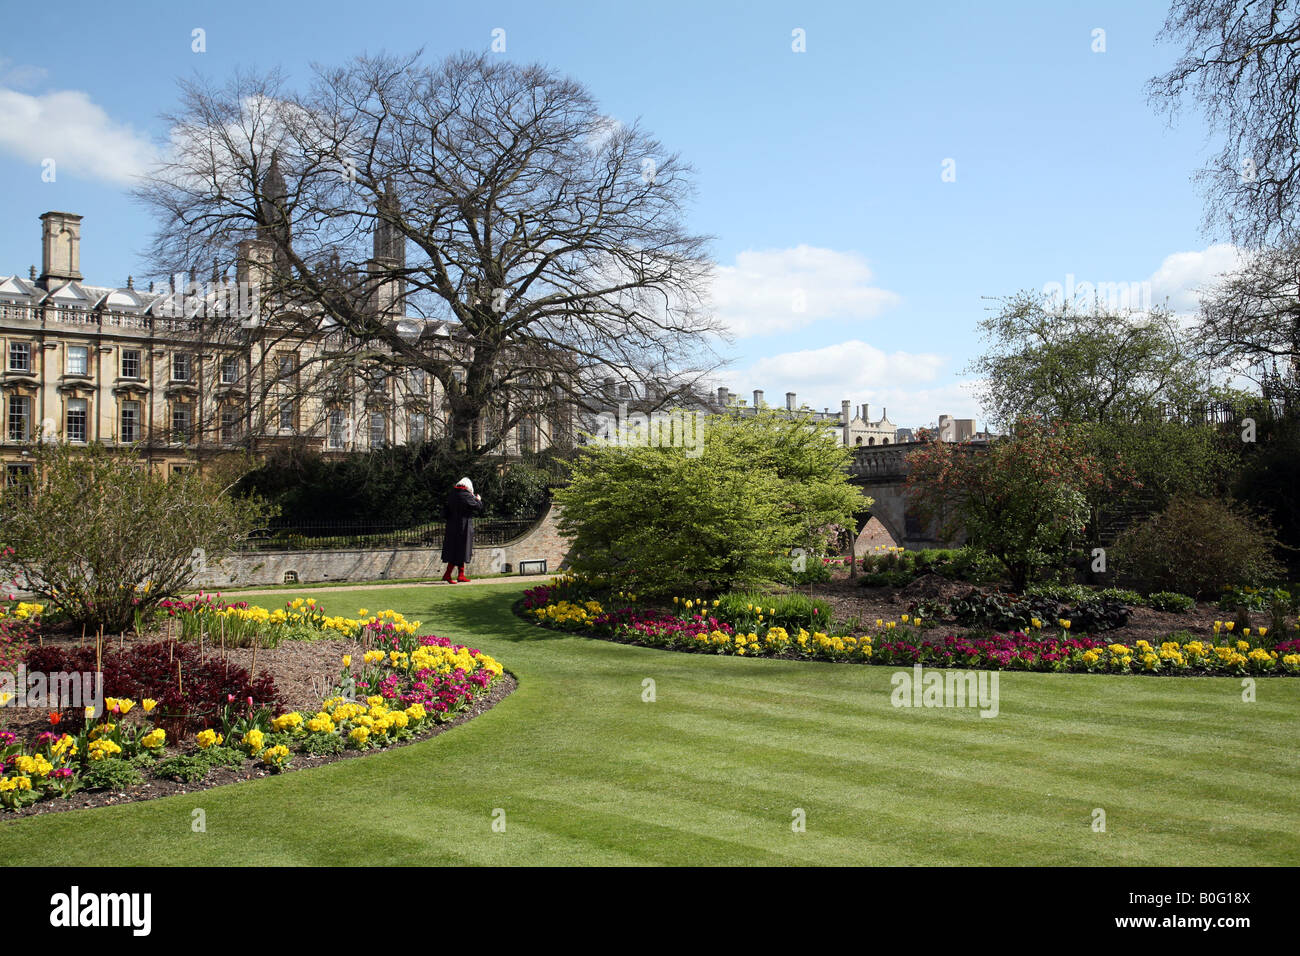 Clare College, Cambridge seen from the Fellows Garden on a fine spring morning - Stock Image